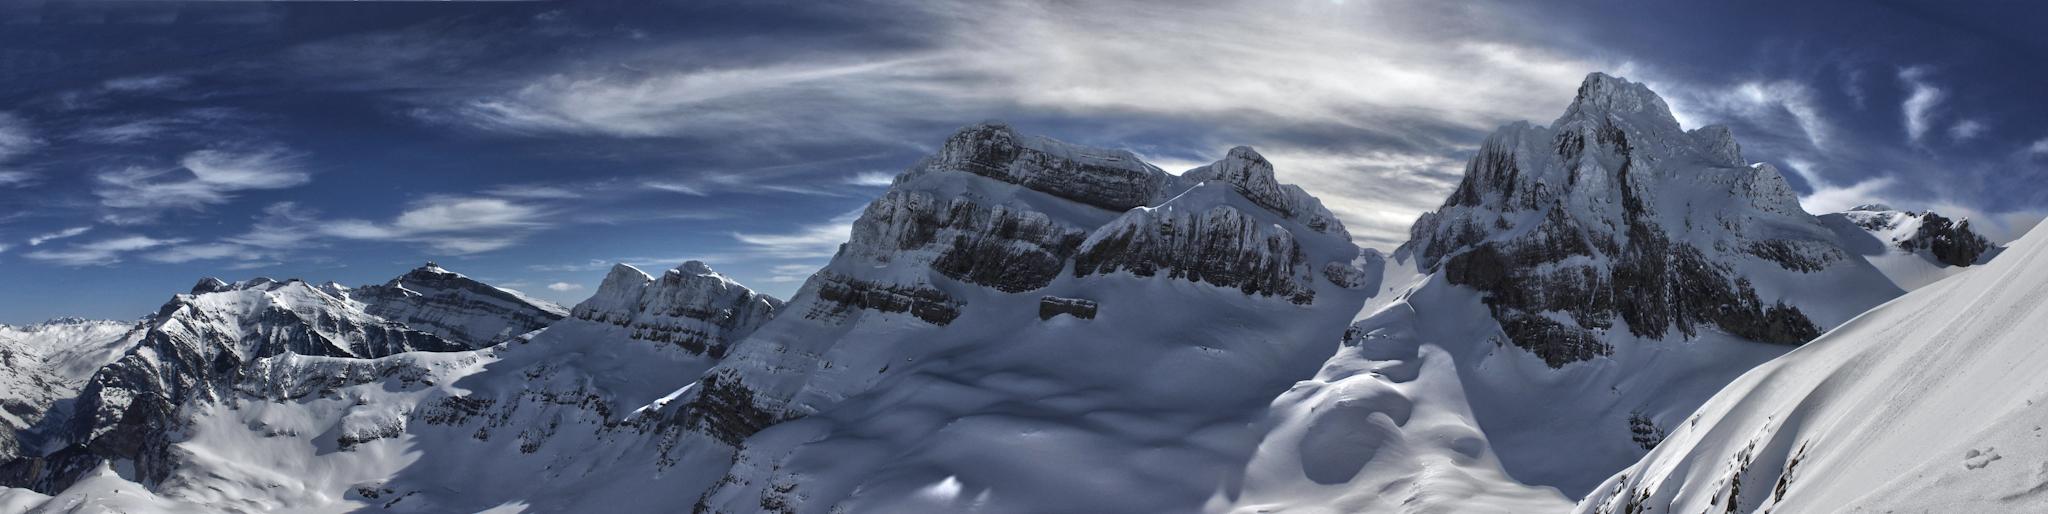 Panorámica del Macizo del Aspe - Paisajes del valle - Fotos del Valle del Aragón, Mikel Besga